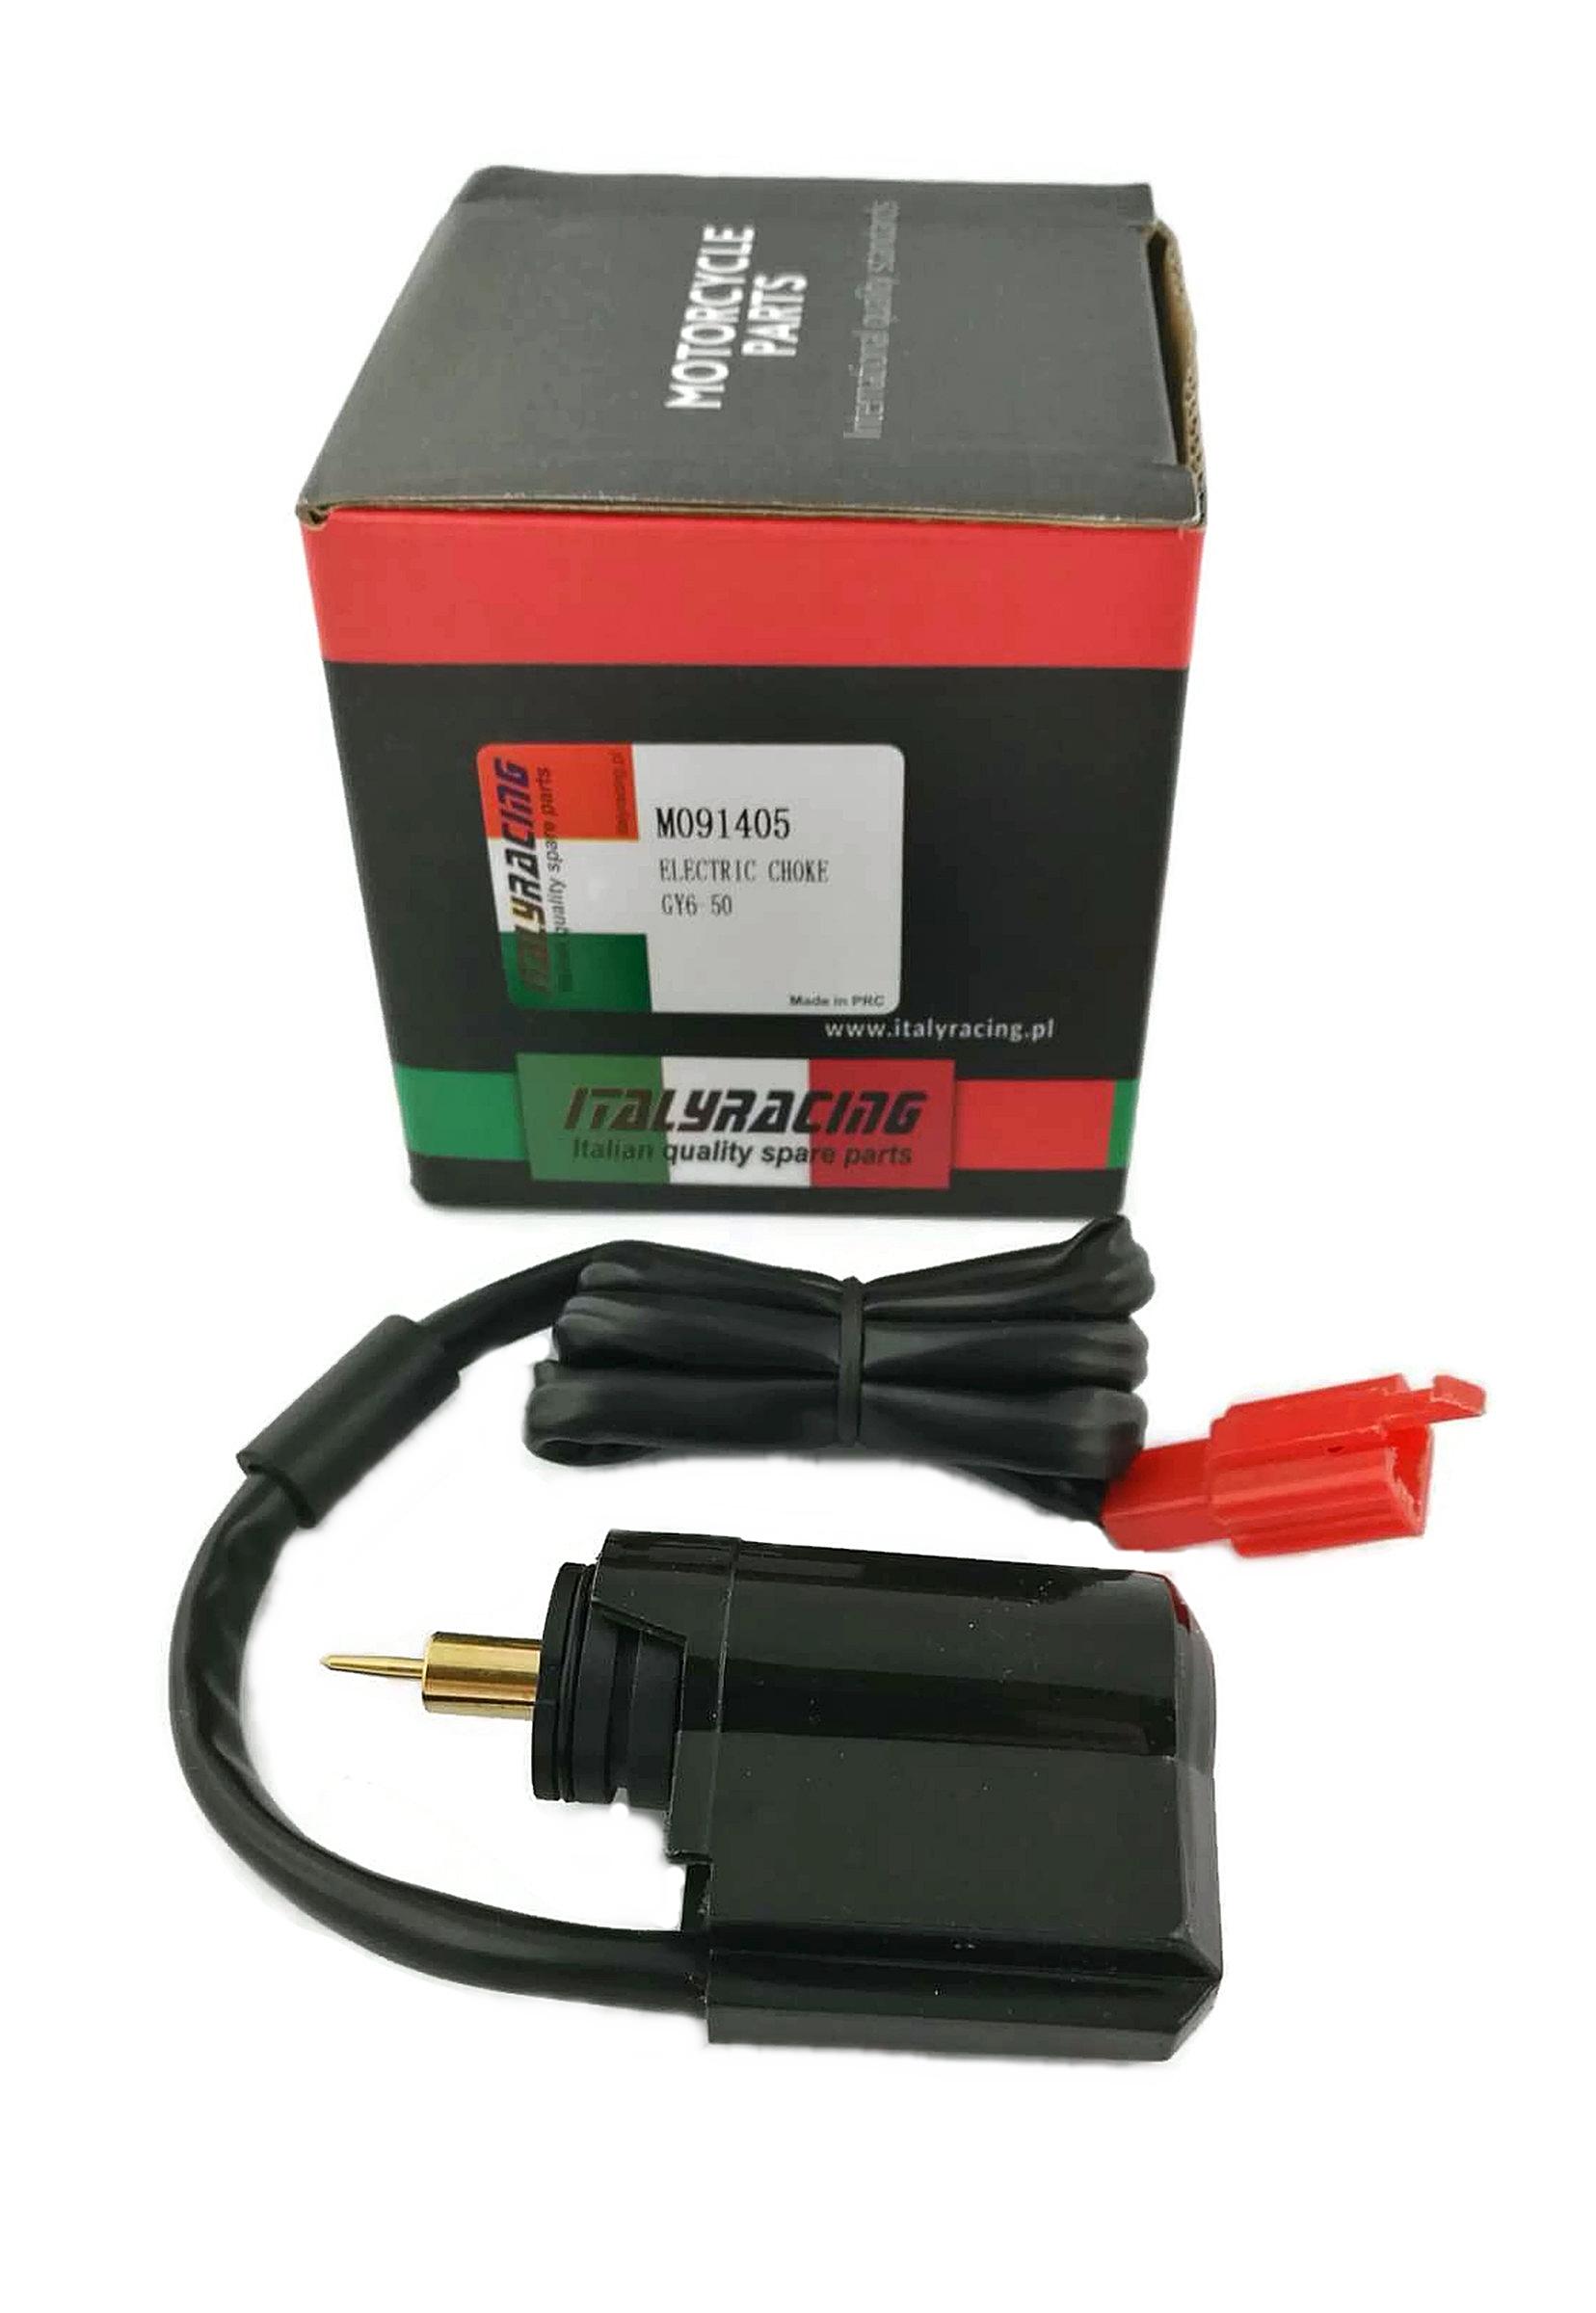 KR VERGASER E-CHOKE Piaggio Zip 50 2T DT  01